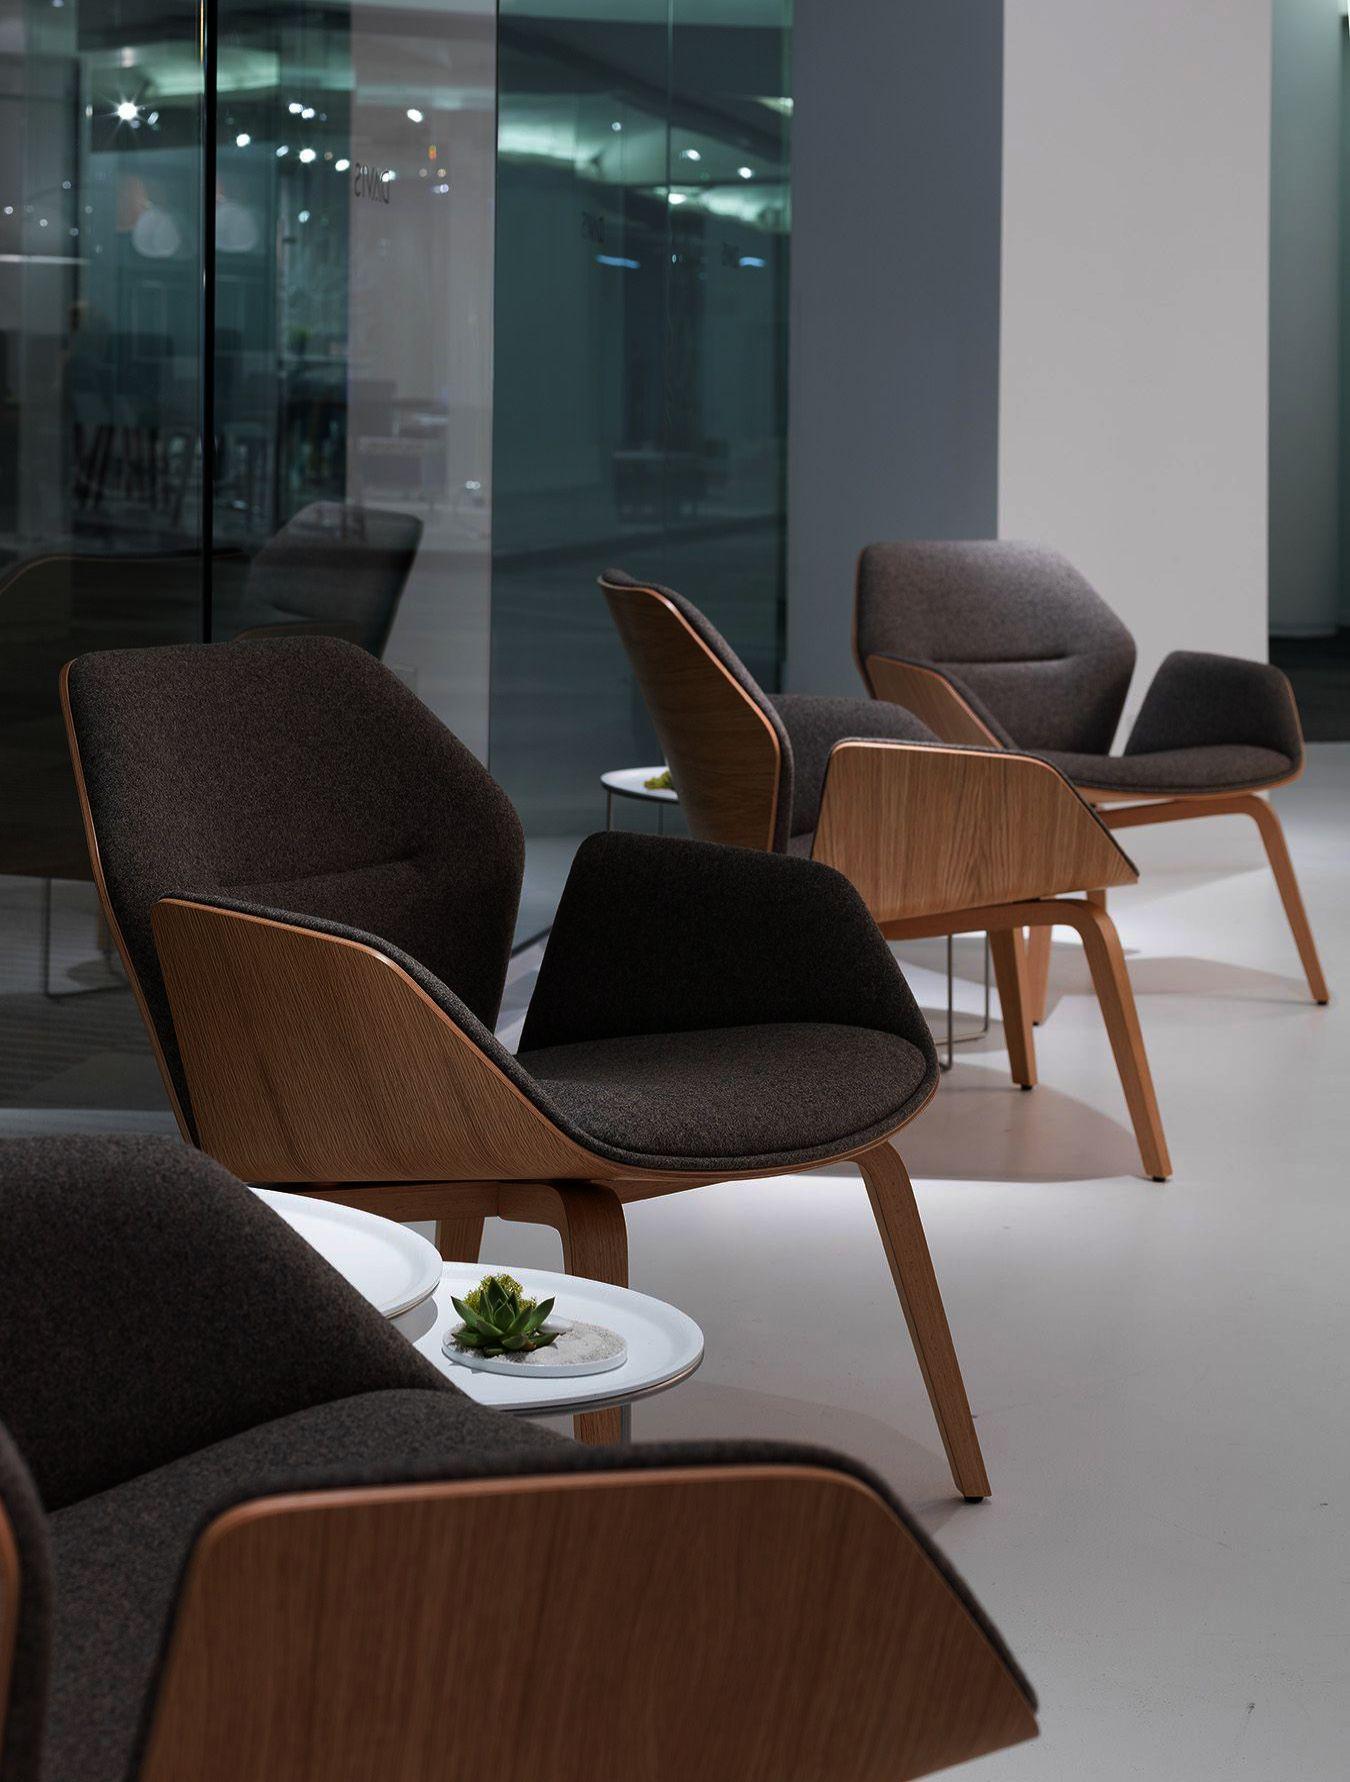 Classic Accessories Veranda Patio Rocking Chair Cover in